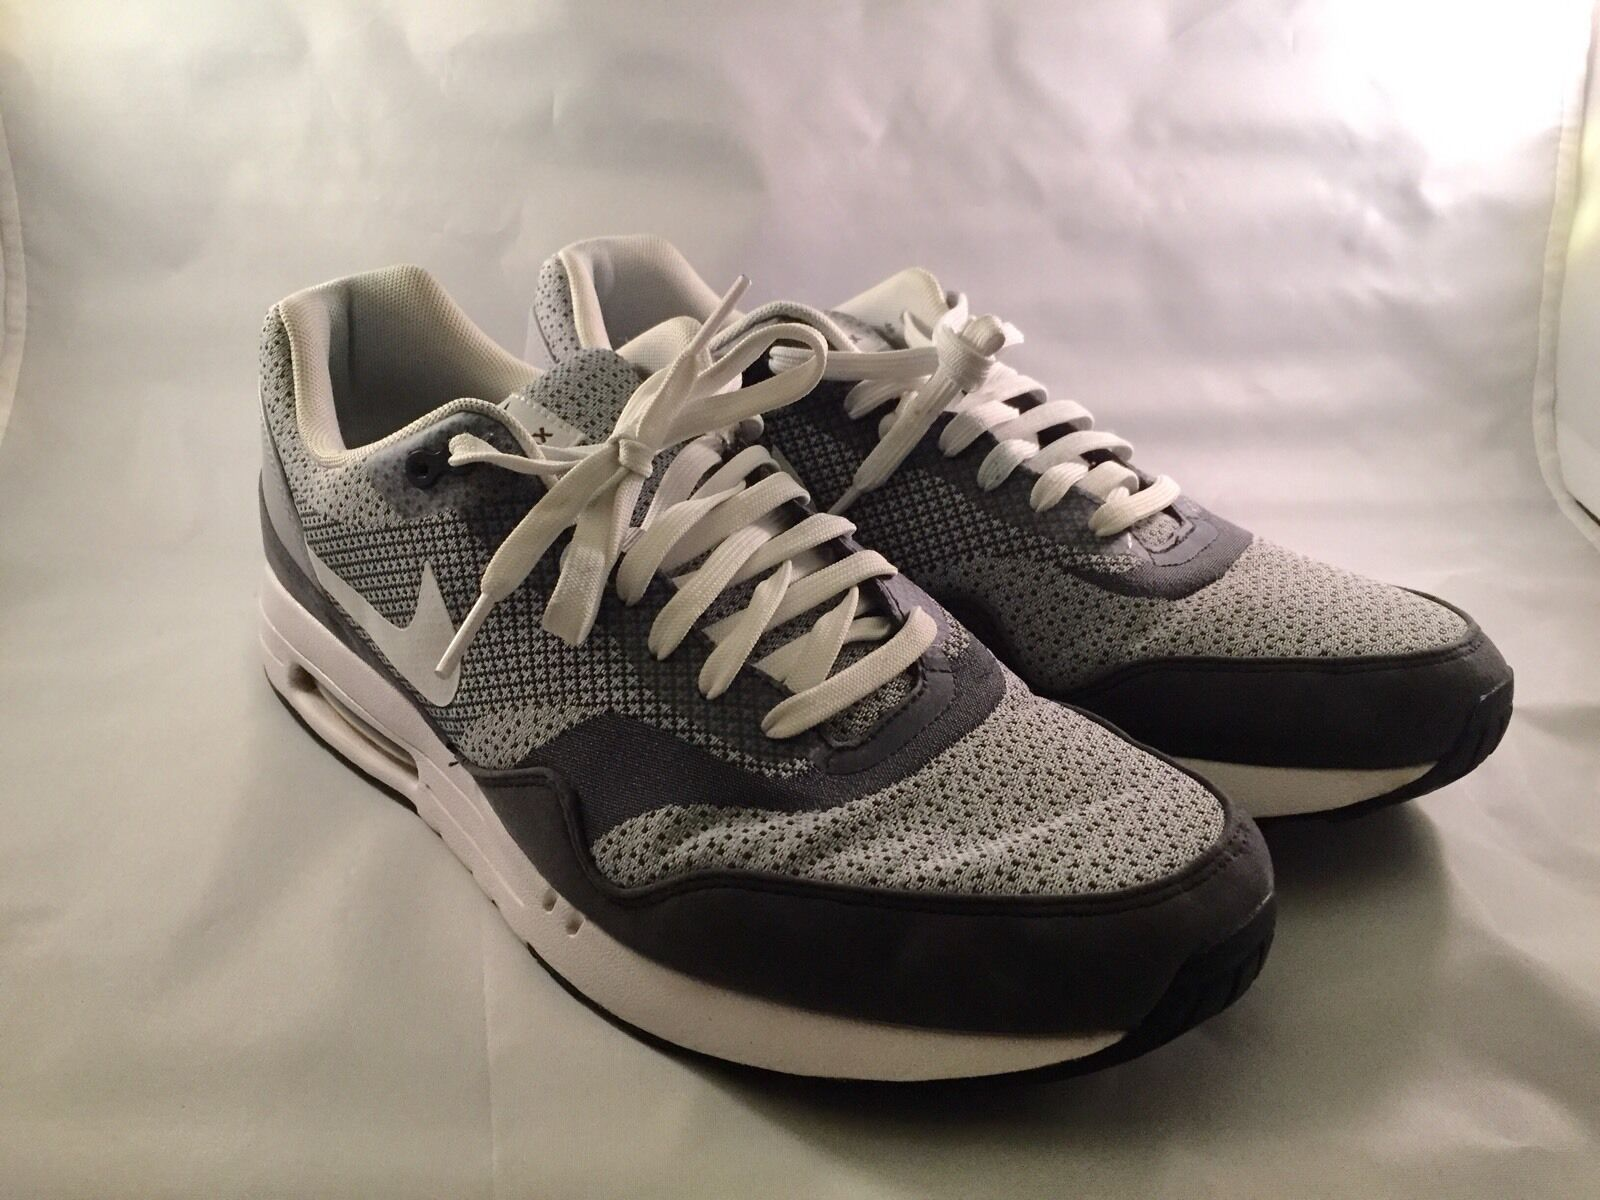 Sällsynt Nike Air Max Jacquard JCRD Ren Platinum Vit Svart 644153-001 Sz 12